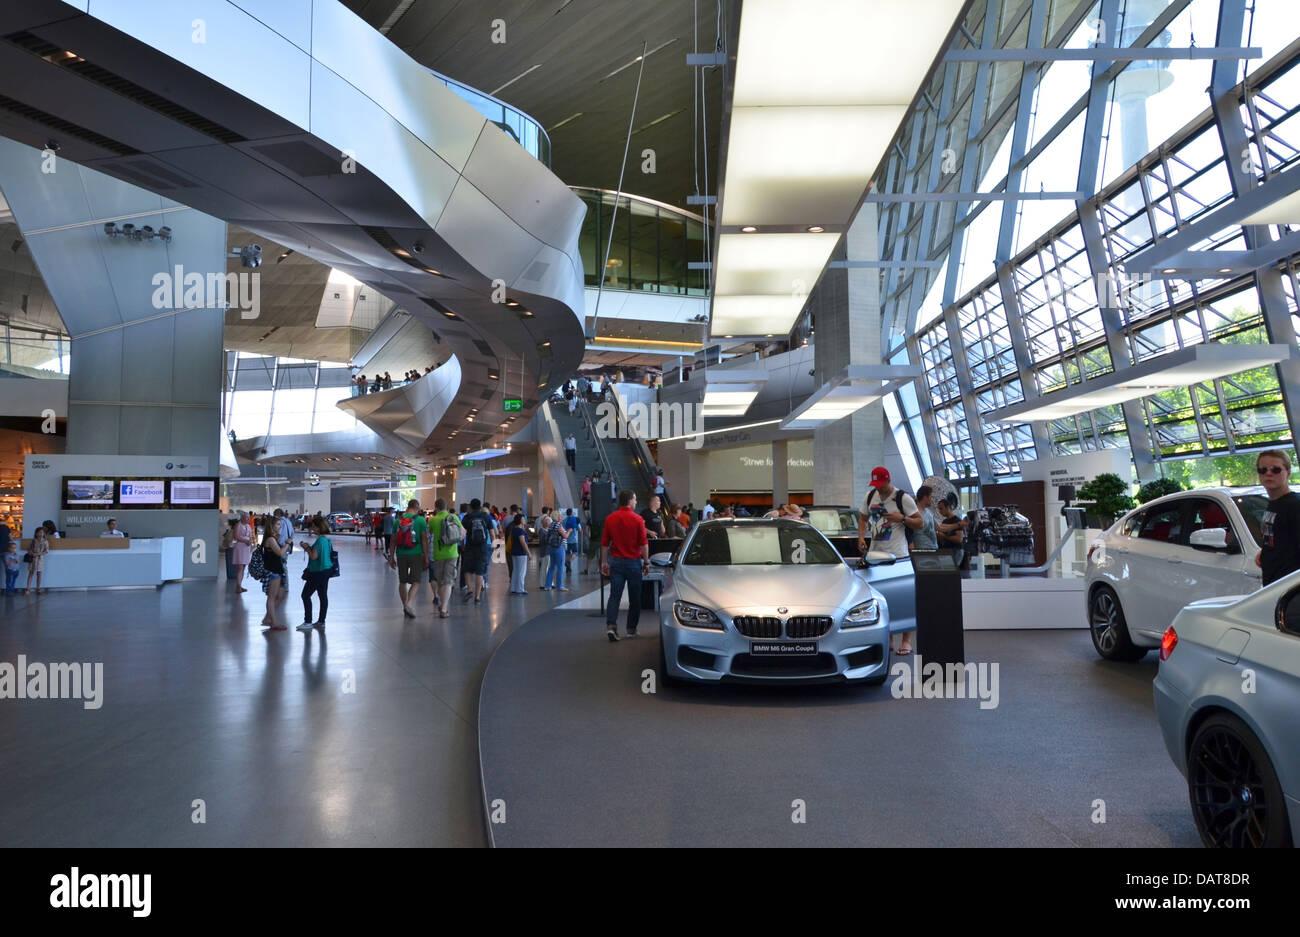 BMW Welt BMW World fantastic futuristic architectural design! Munich, Bavaria, Germany - Stock Image